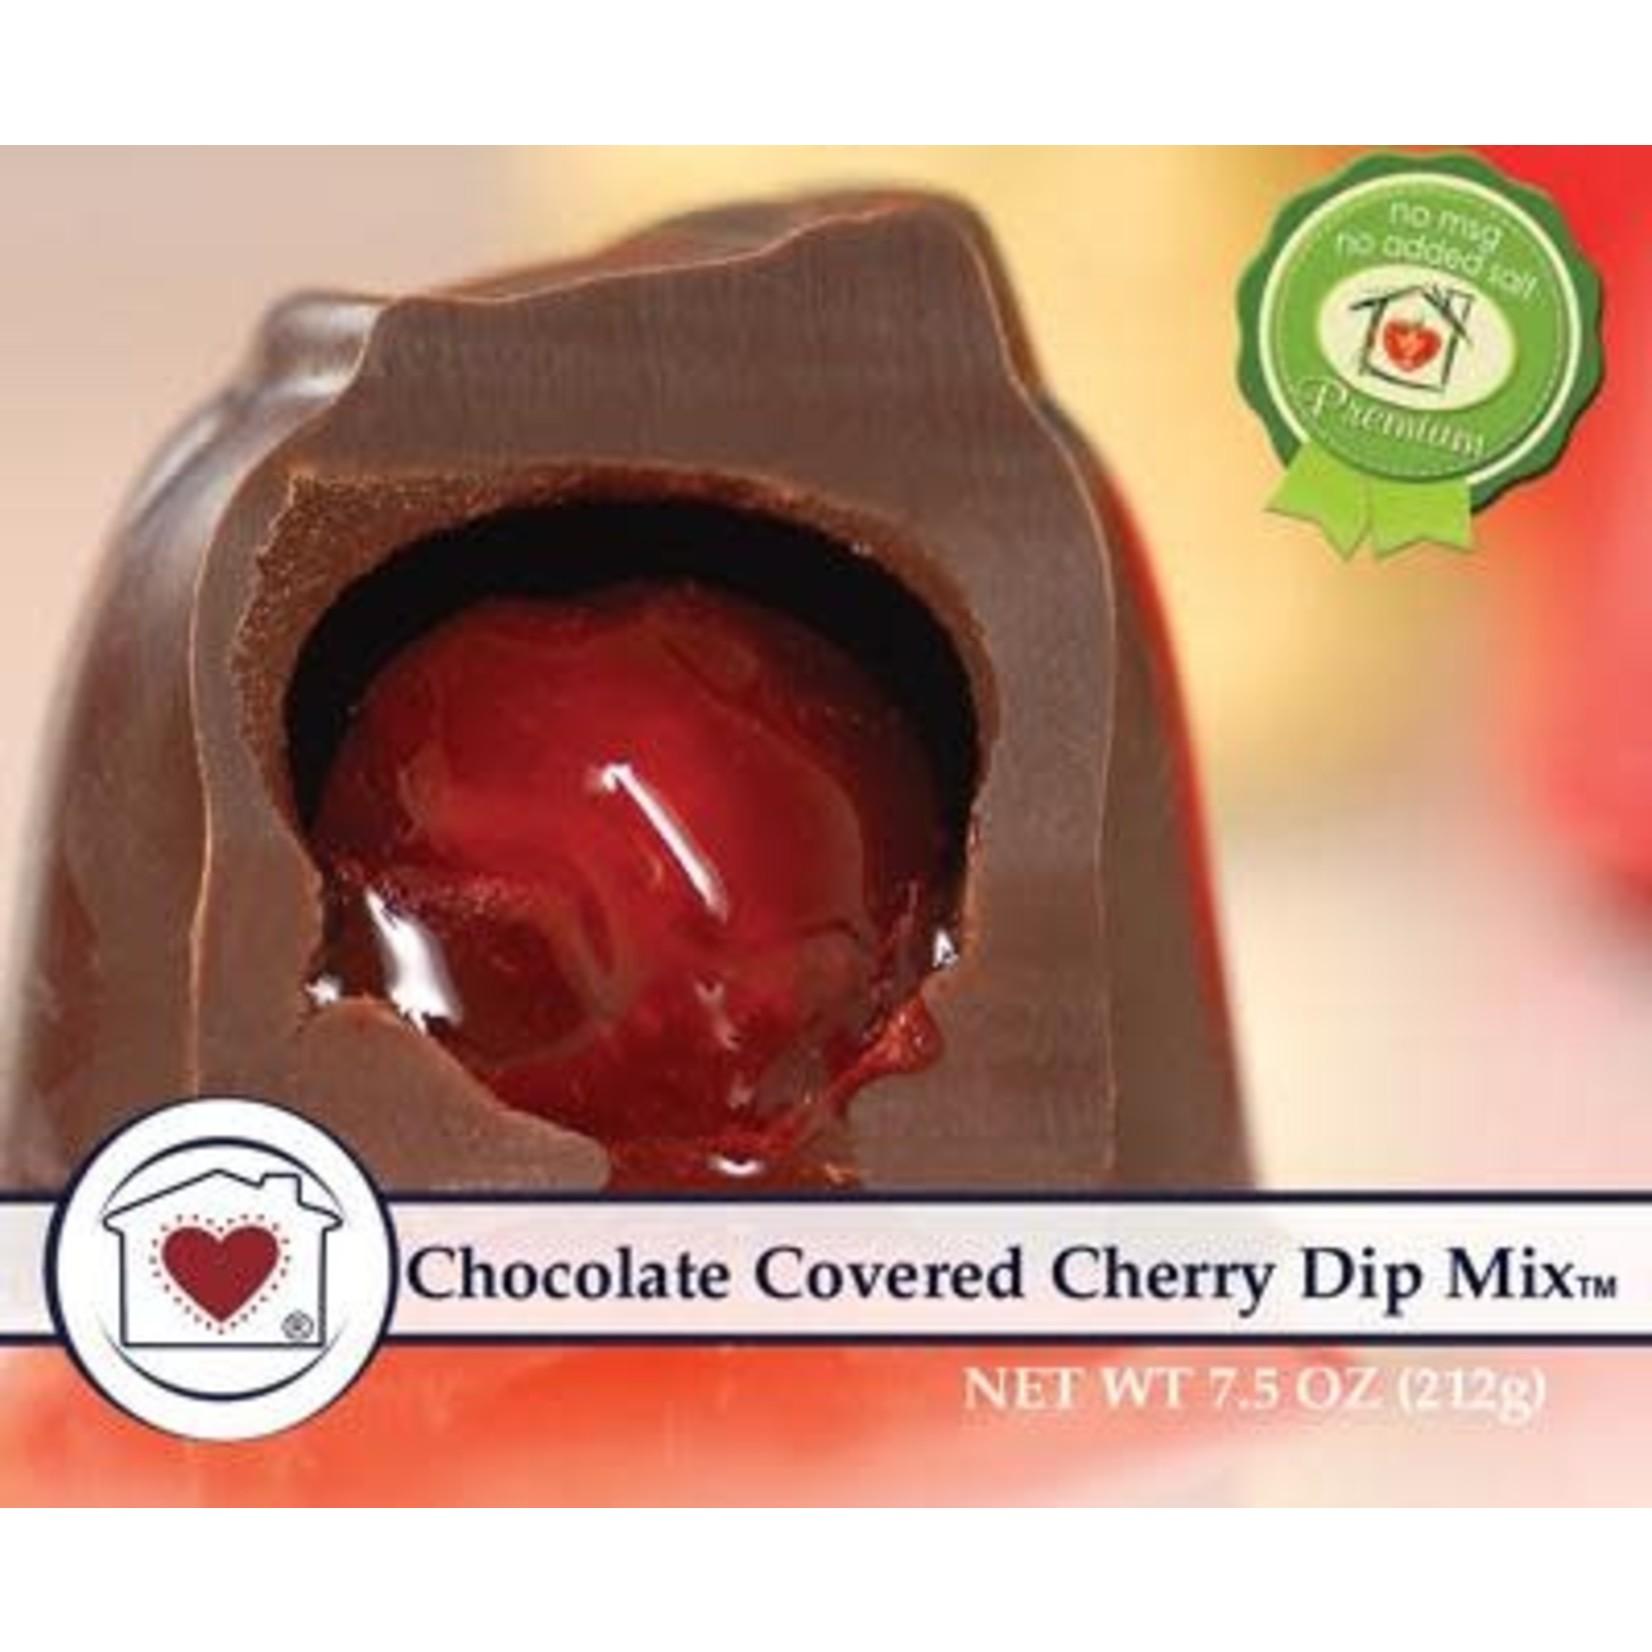 CHOCOLATE COVERED CHERRY DIP MIX